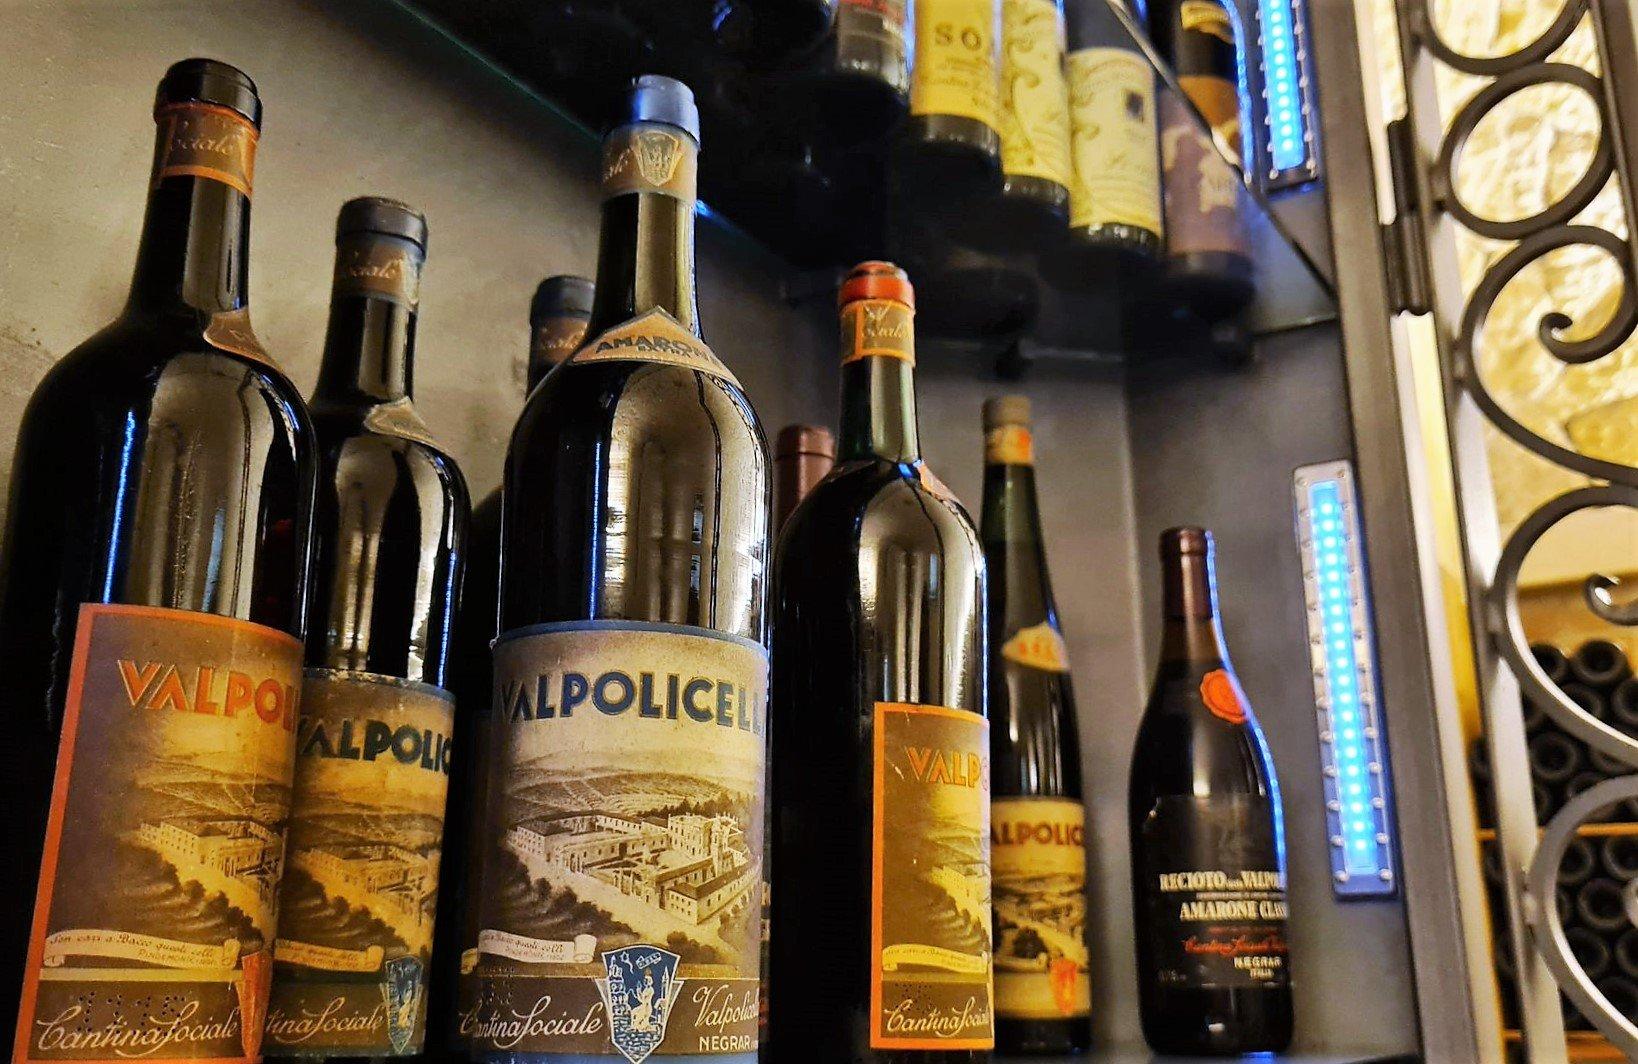 Le bottiglie storiche